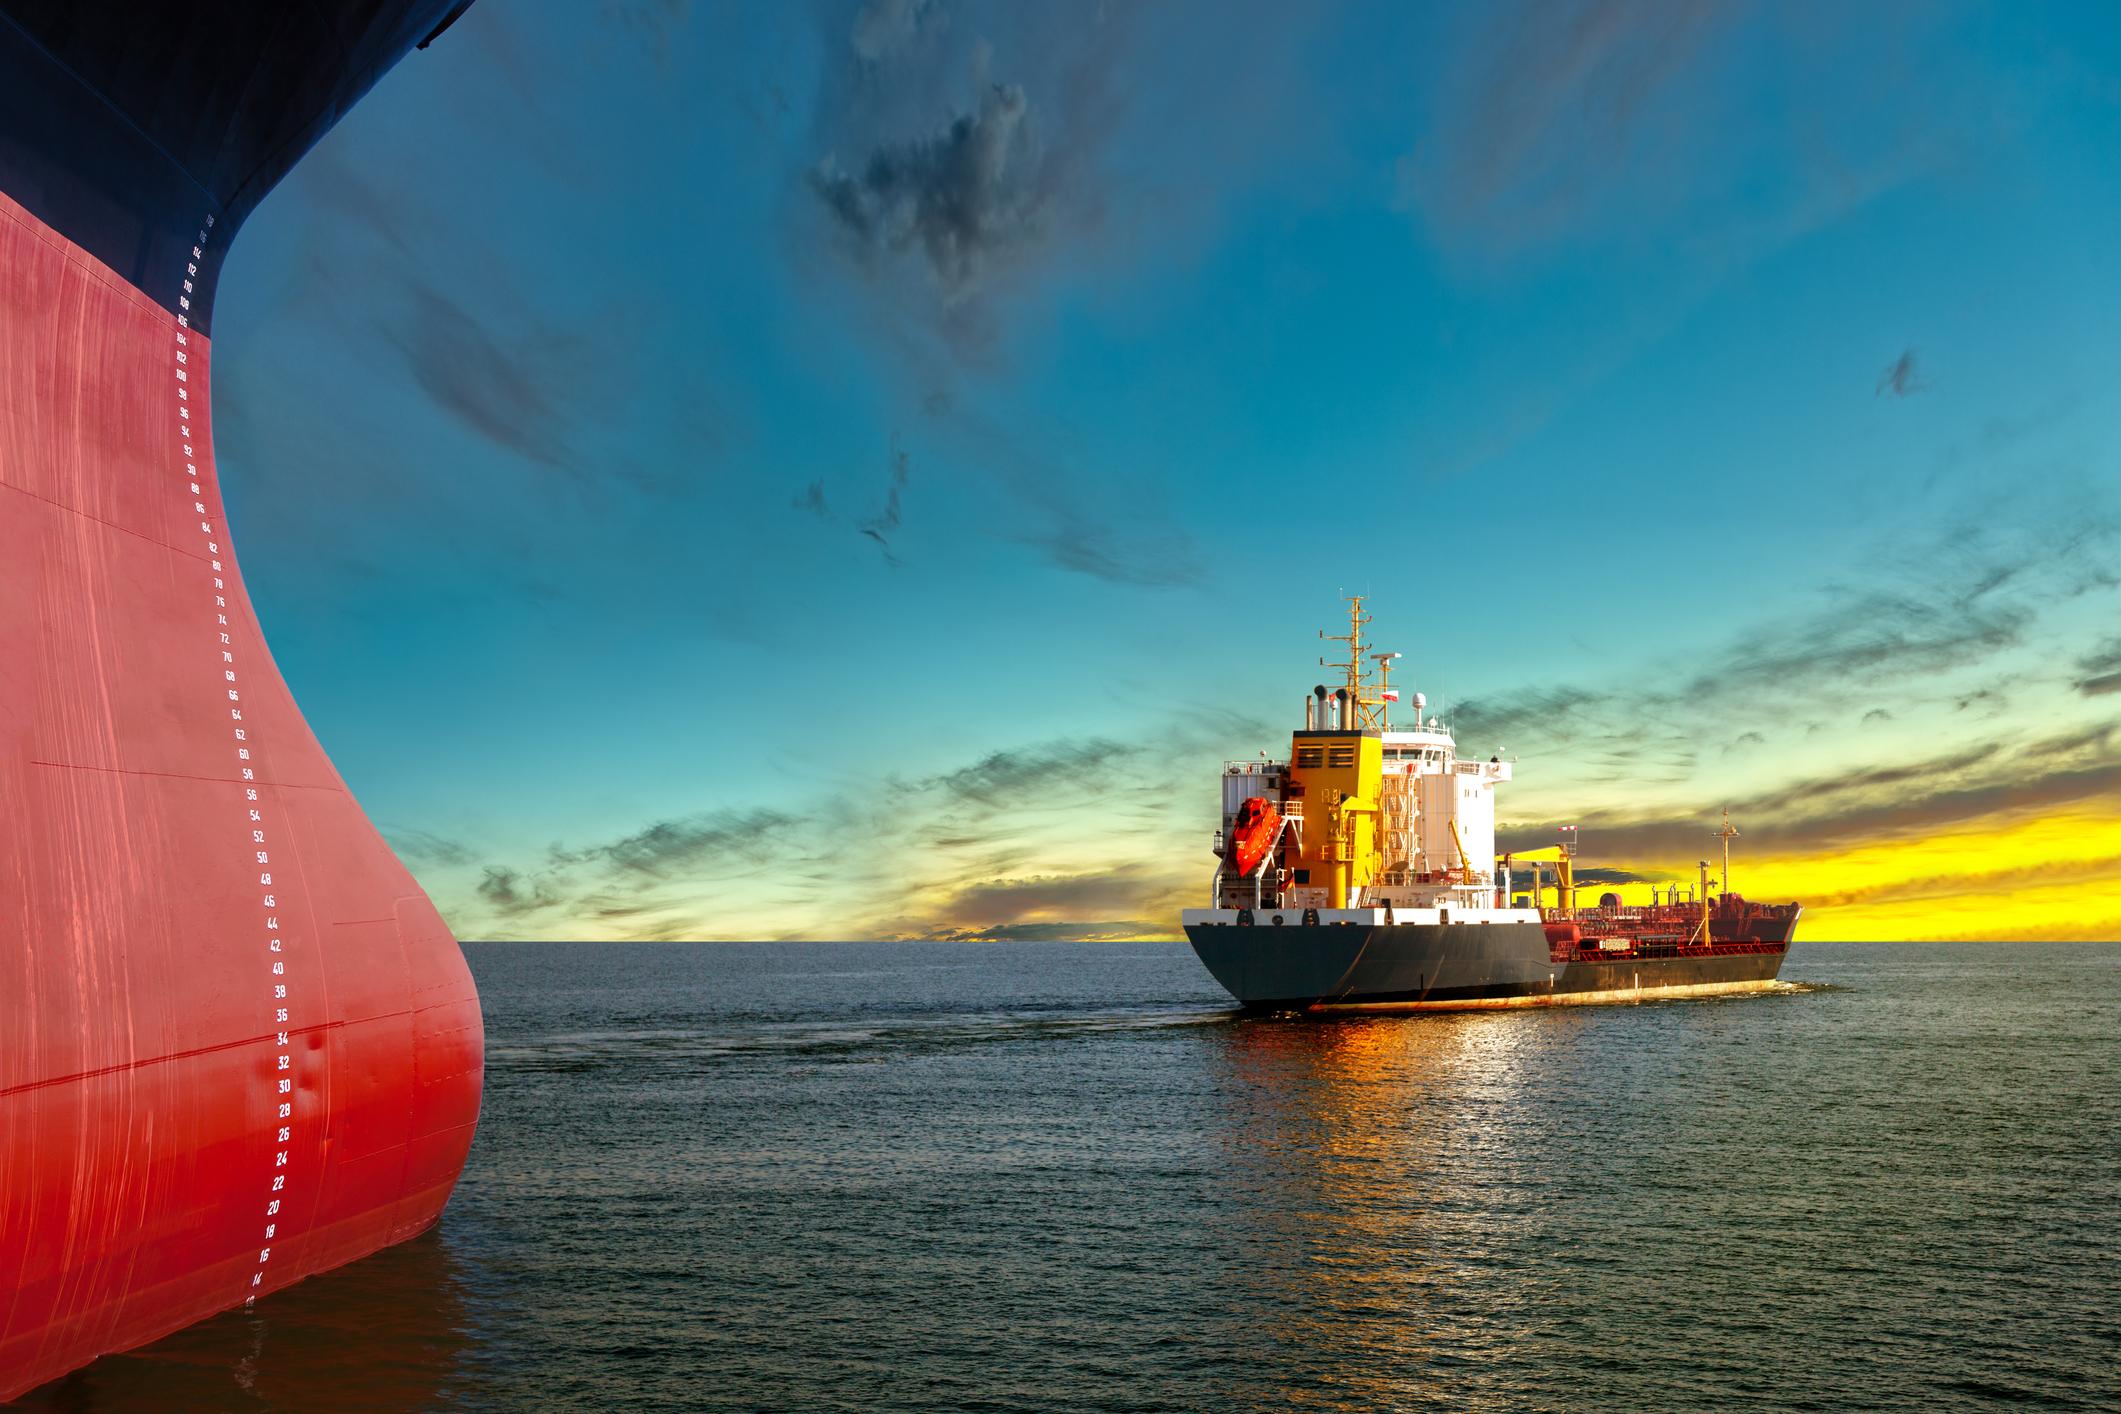 Tanker ships at sunset